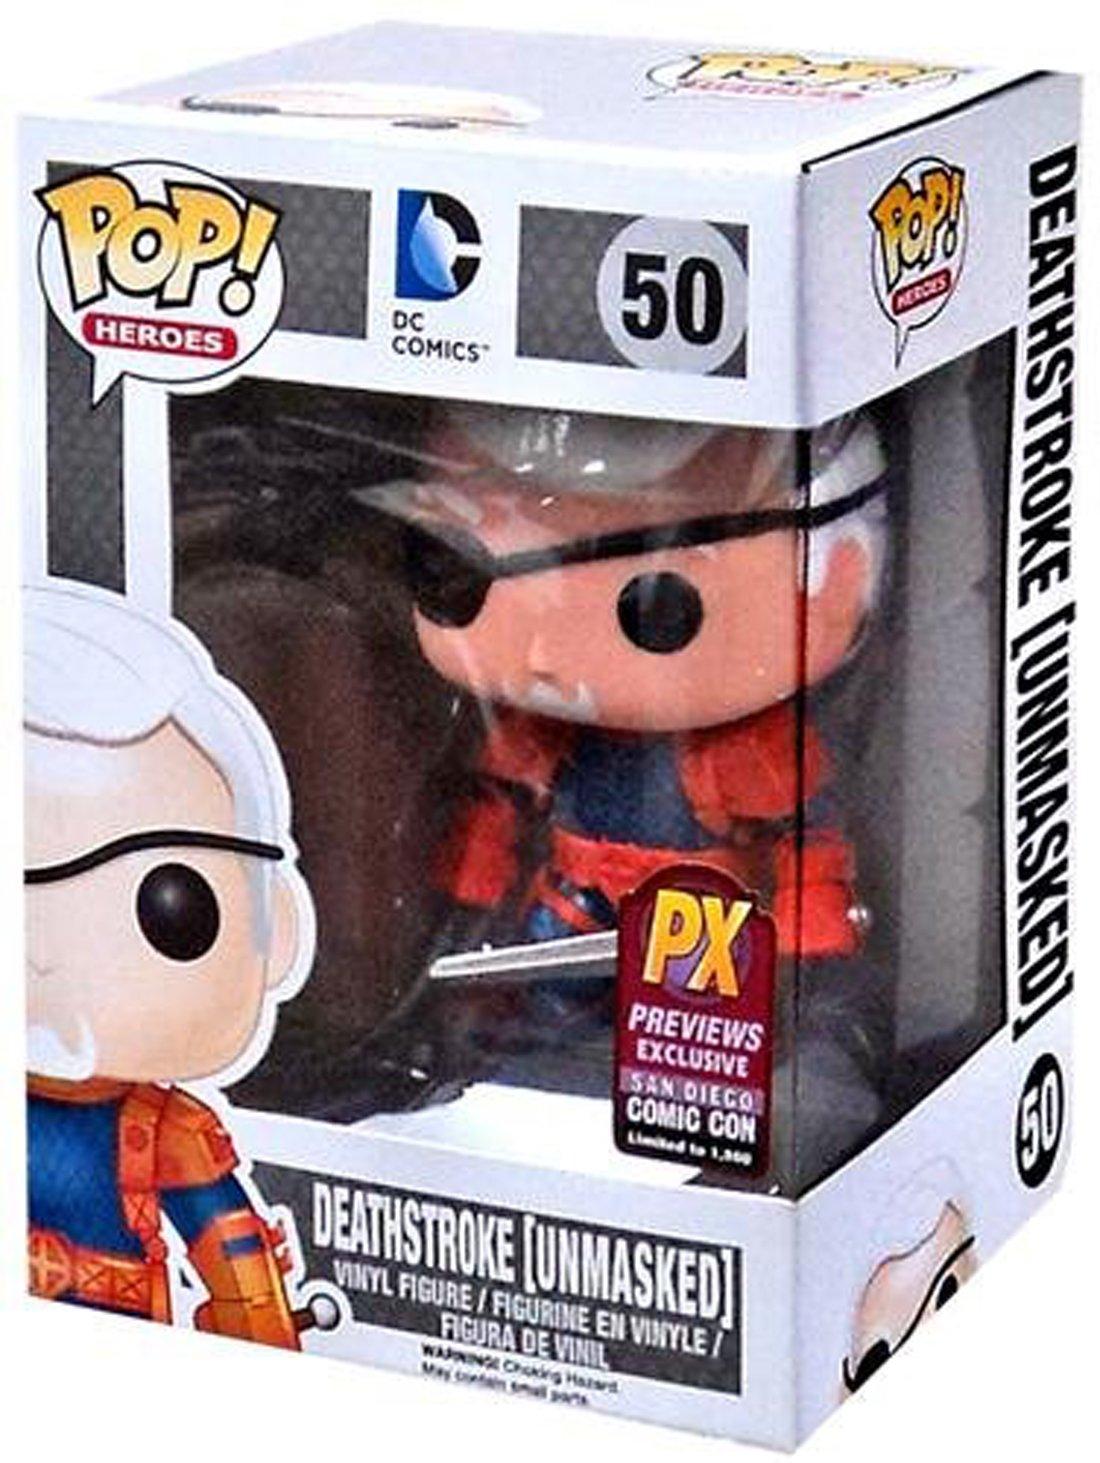 Funko - DC Comics - Deathstroke Unmasked Pop - 10 cm - 0849803043605 B00MEXU8HQ